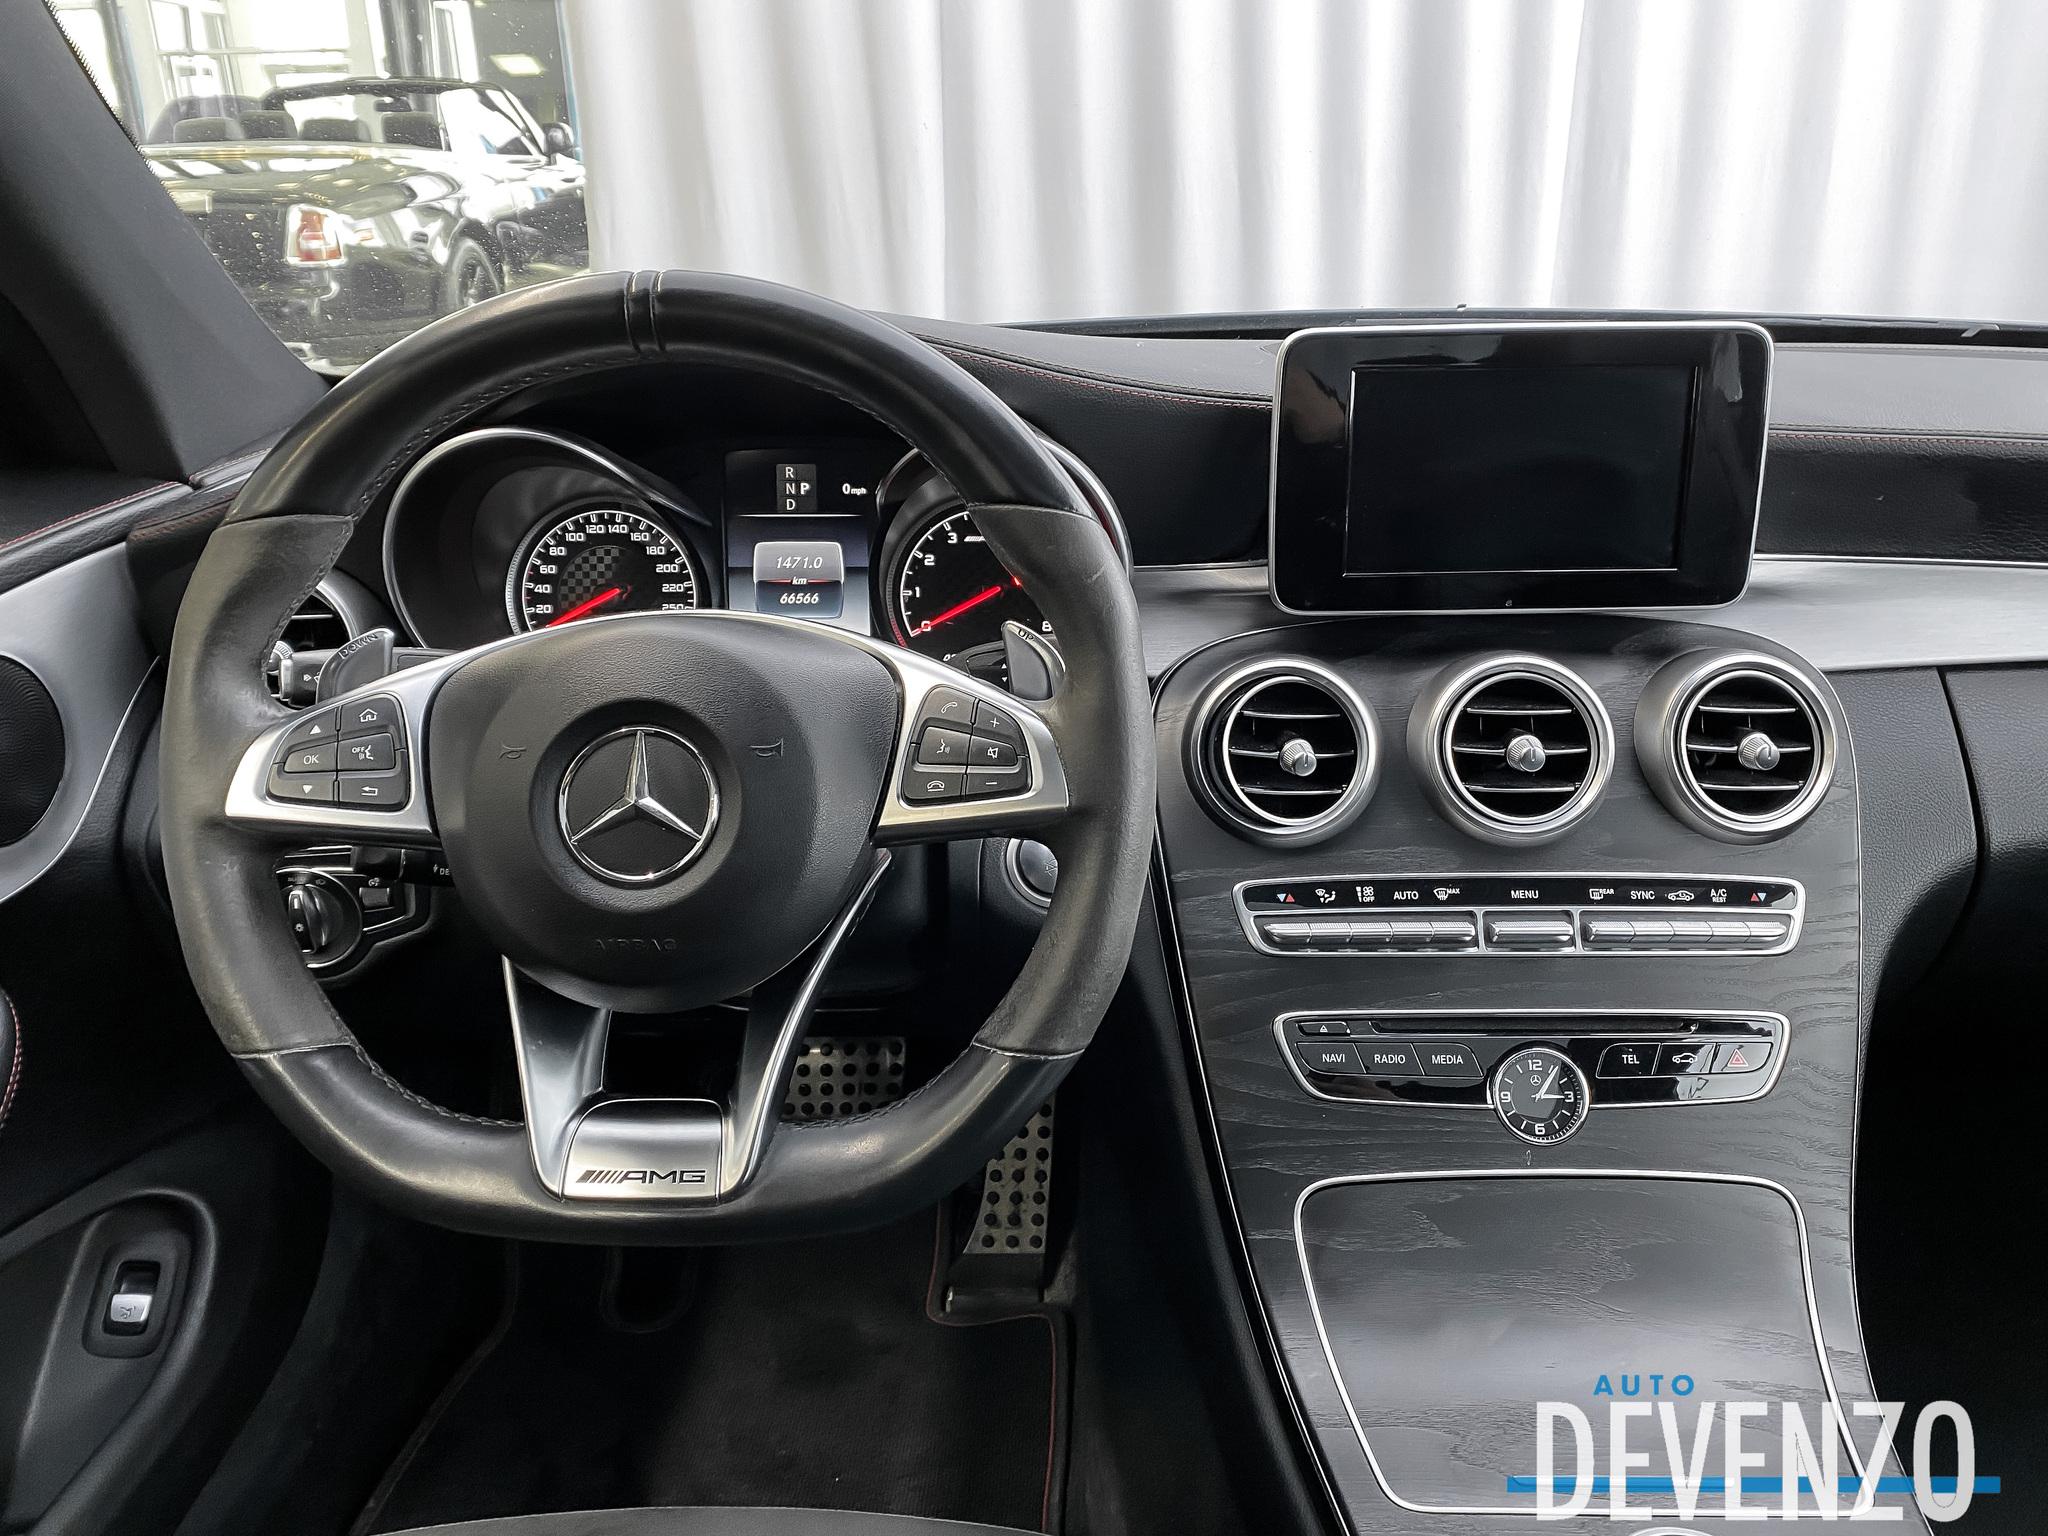 2018 Mercedes-Benz C-Class AMG C43 4MATIC Coupe  ***Balance de Garantie complet